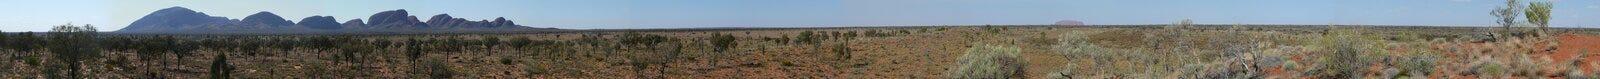 Kata Tjuta (Olgas) e panorama de Uluru (rocha de Ayers) foto de stock